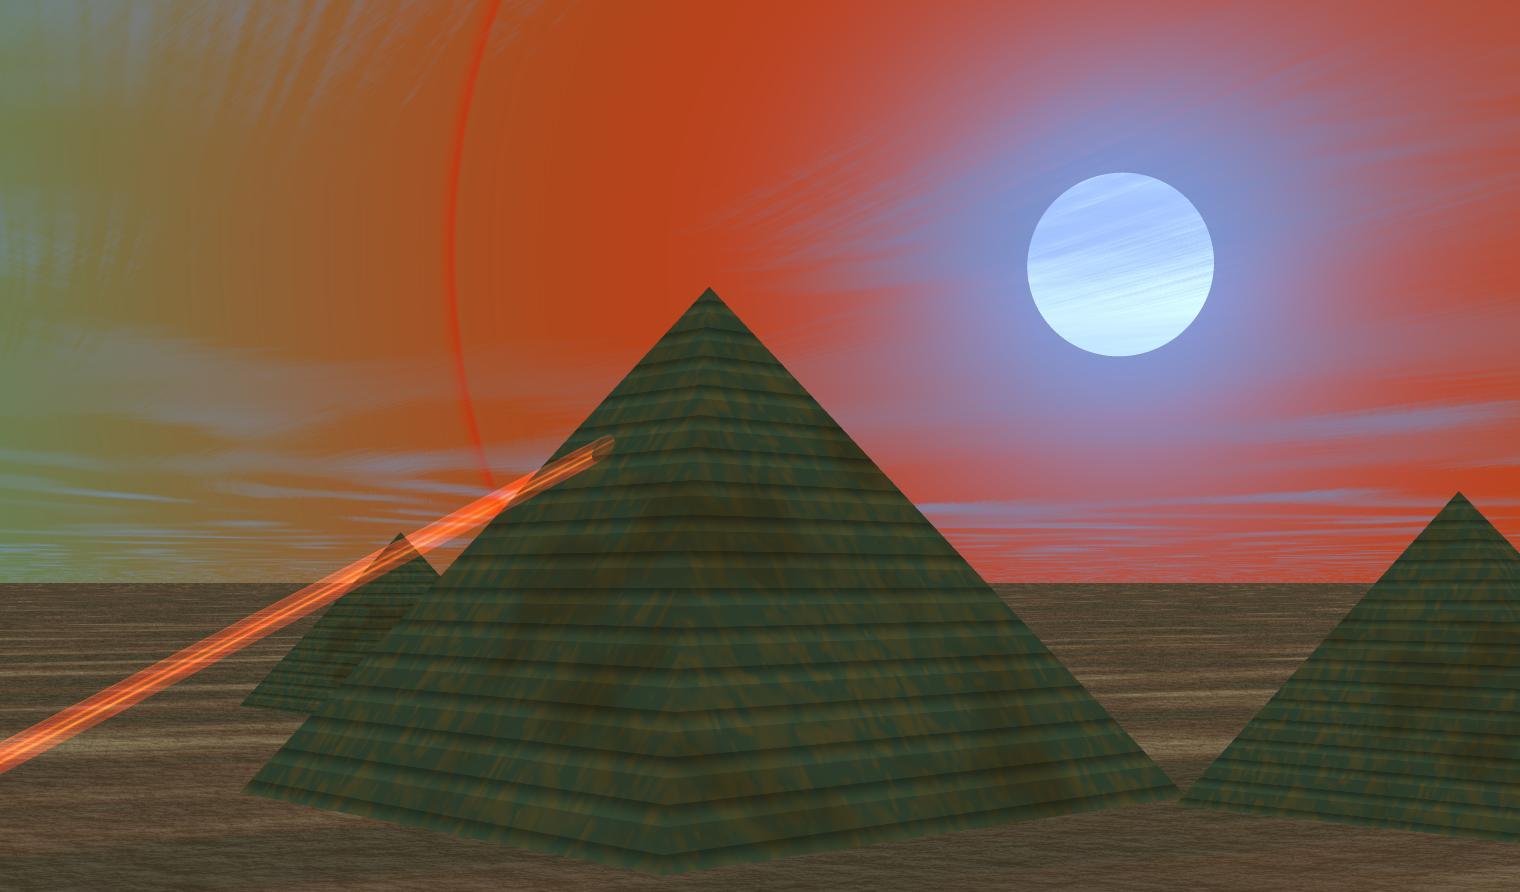 At Giza: ANCHUNT EJIPSHUN